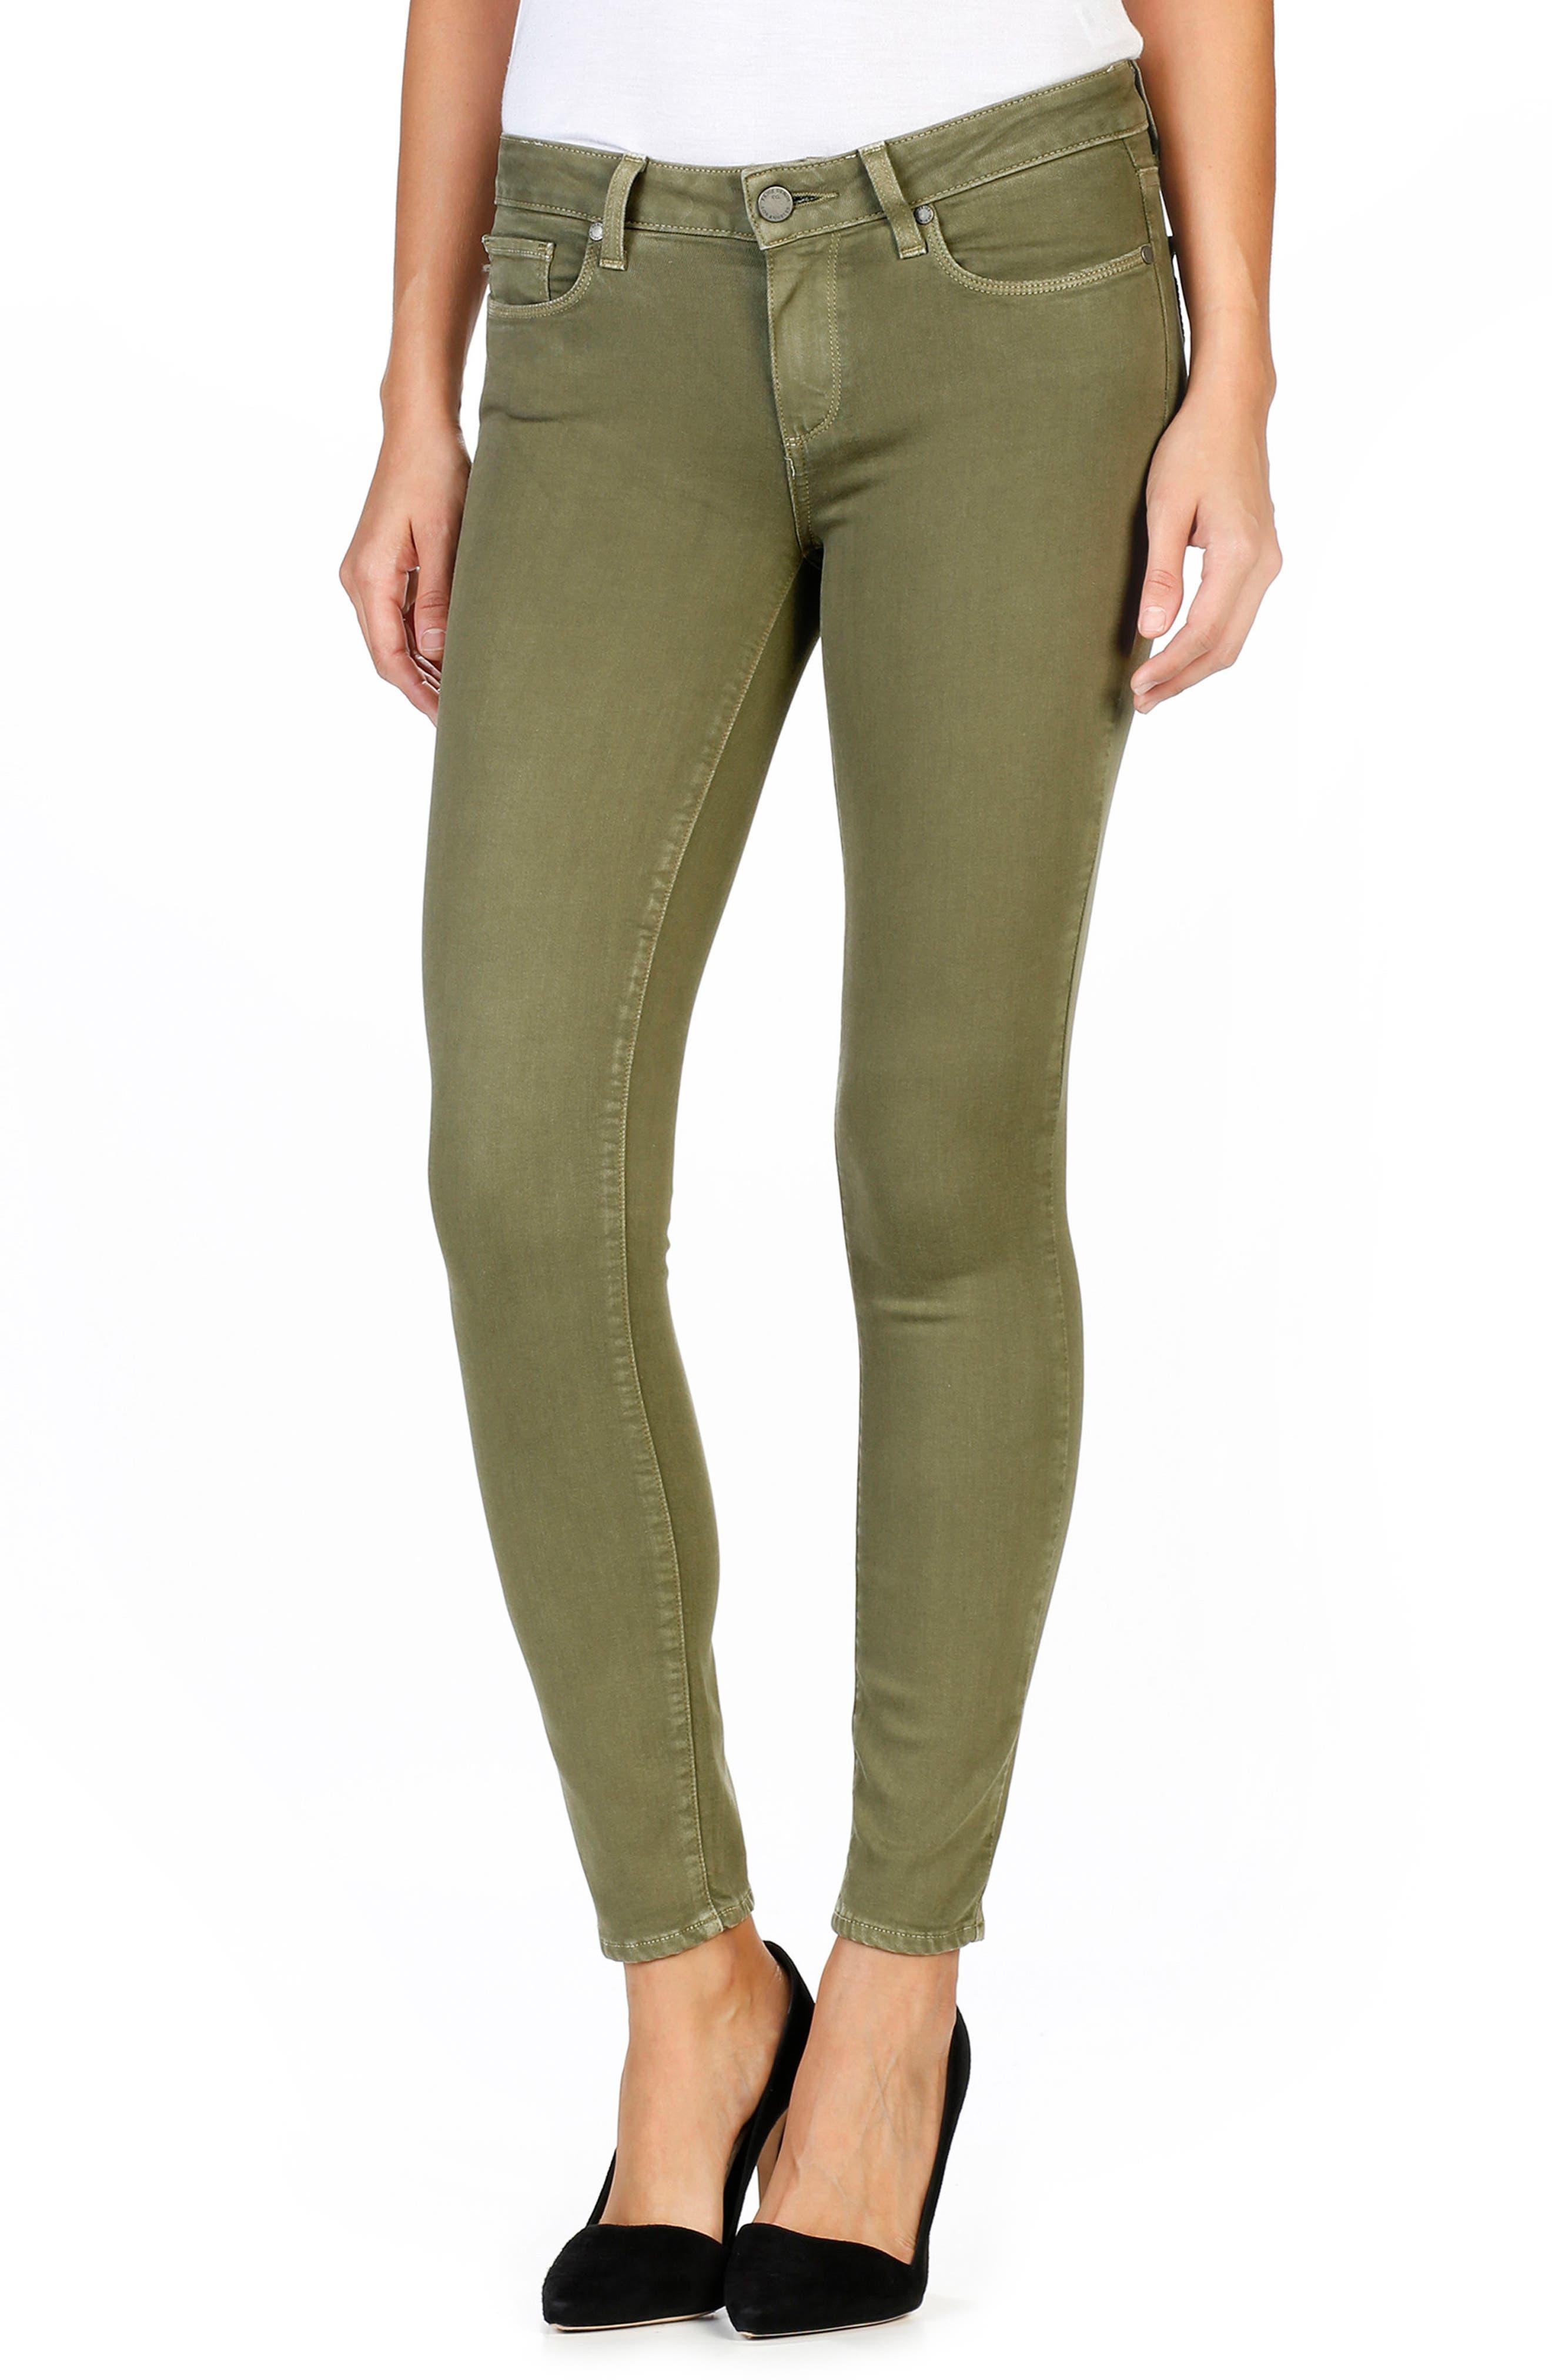 Transcend - Verdugo Ankle Skinny Jeans,                         Main,                         color, Sahara Green